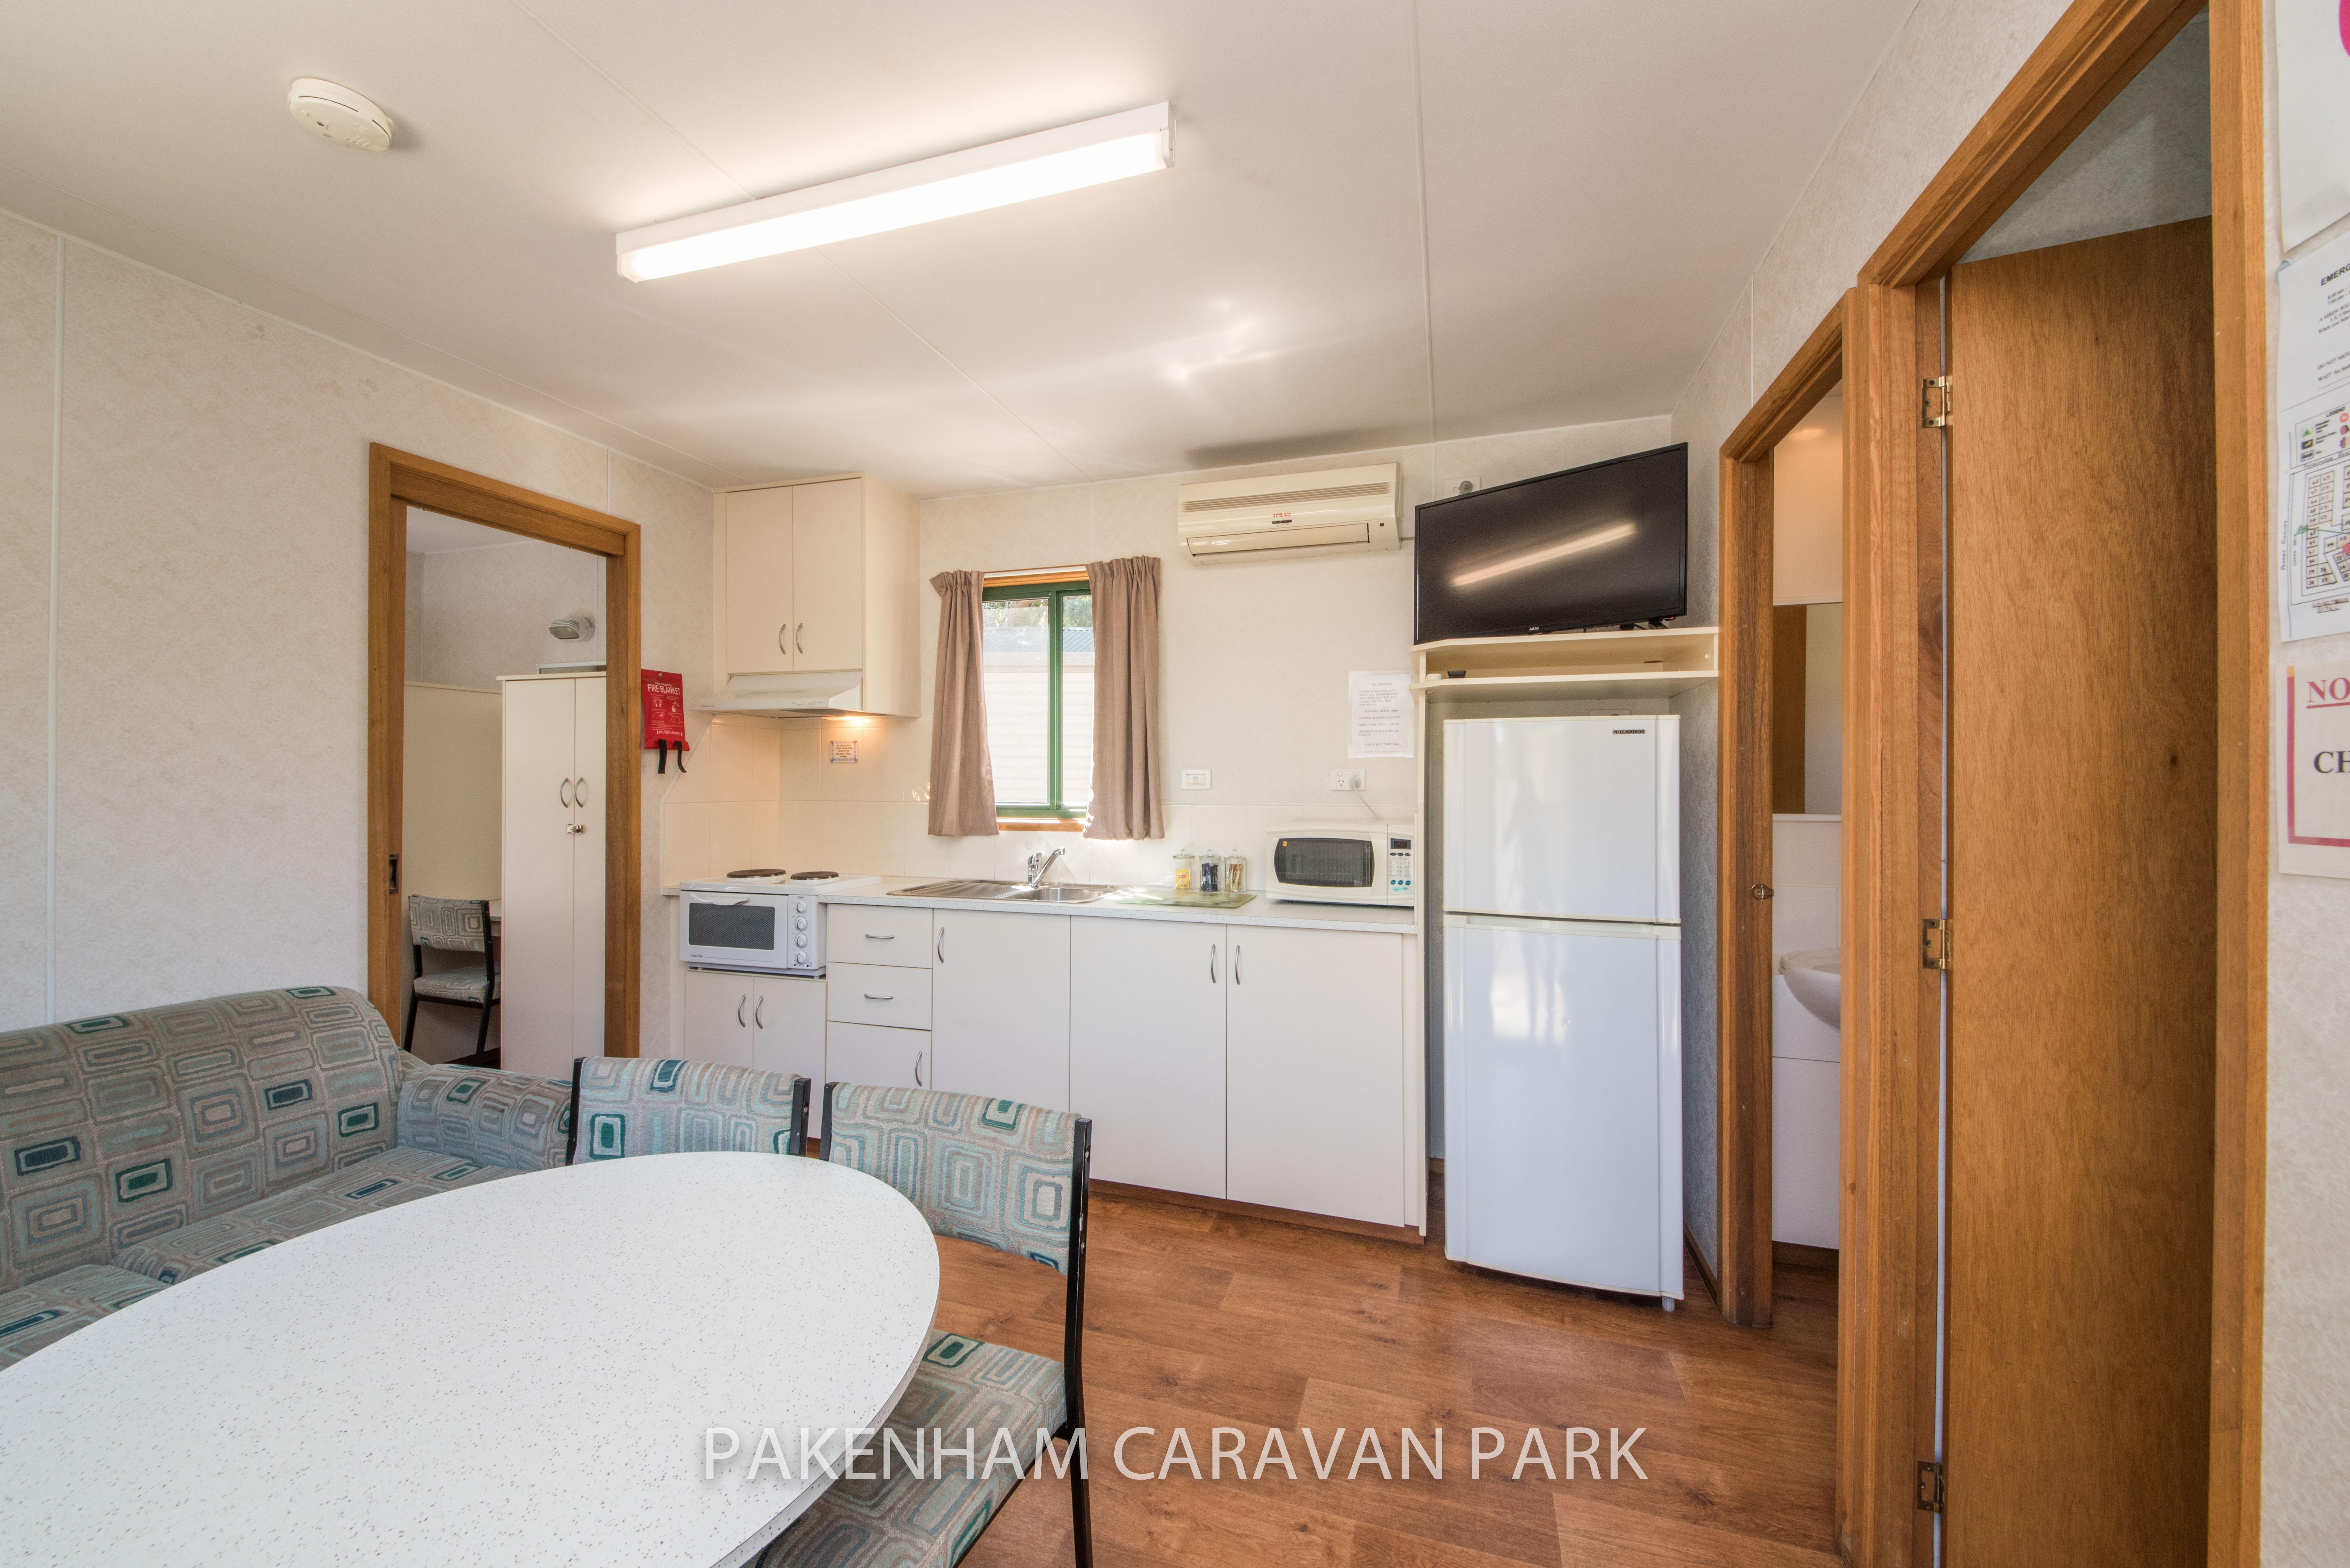 standard cabin kitchen, dinning area